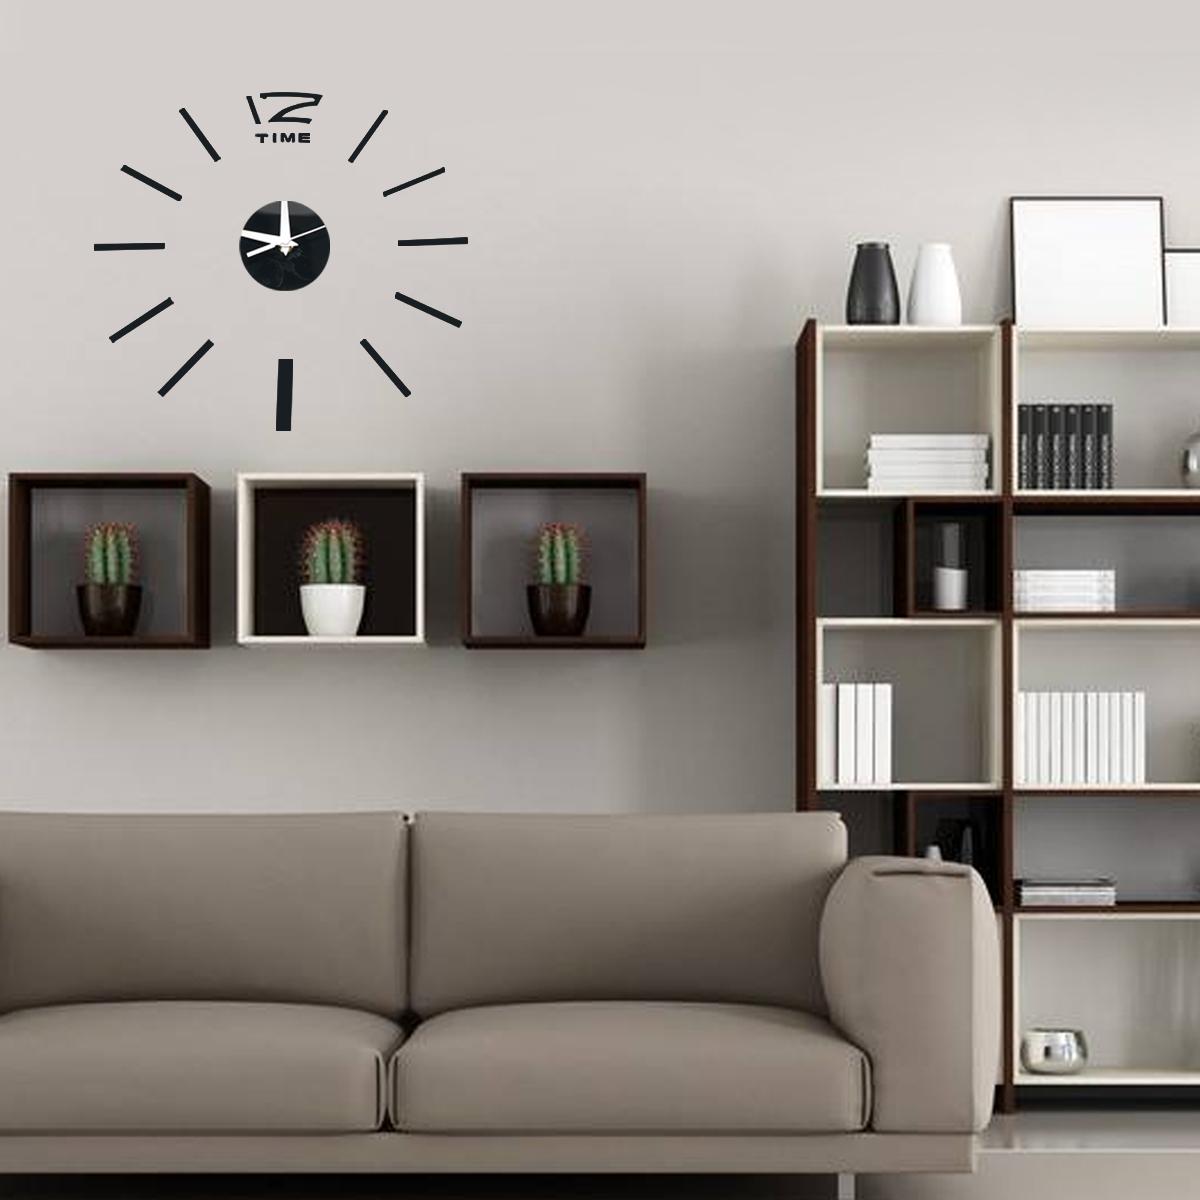 3d diy acrylic mirror sticker wall clock for home for 3d acrylic mirror wall sticker clock decoration decor